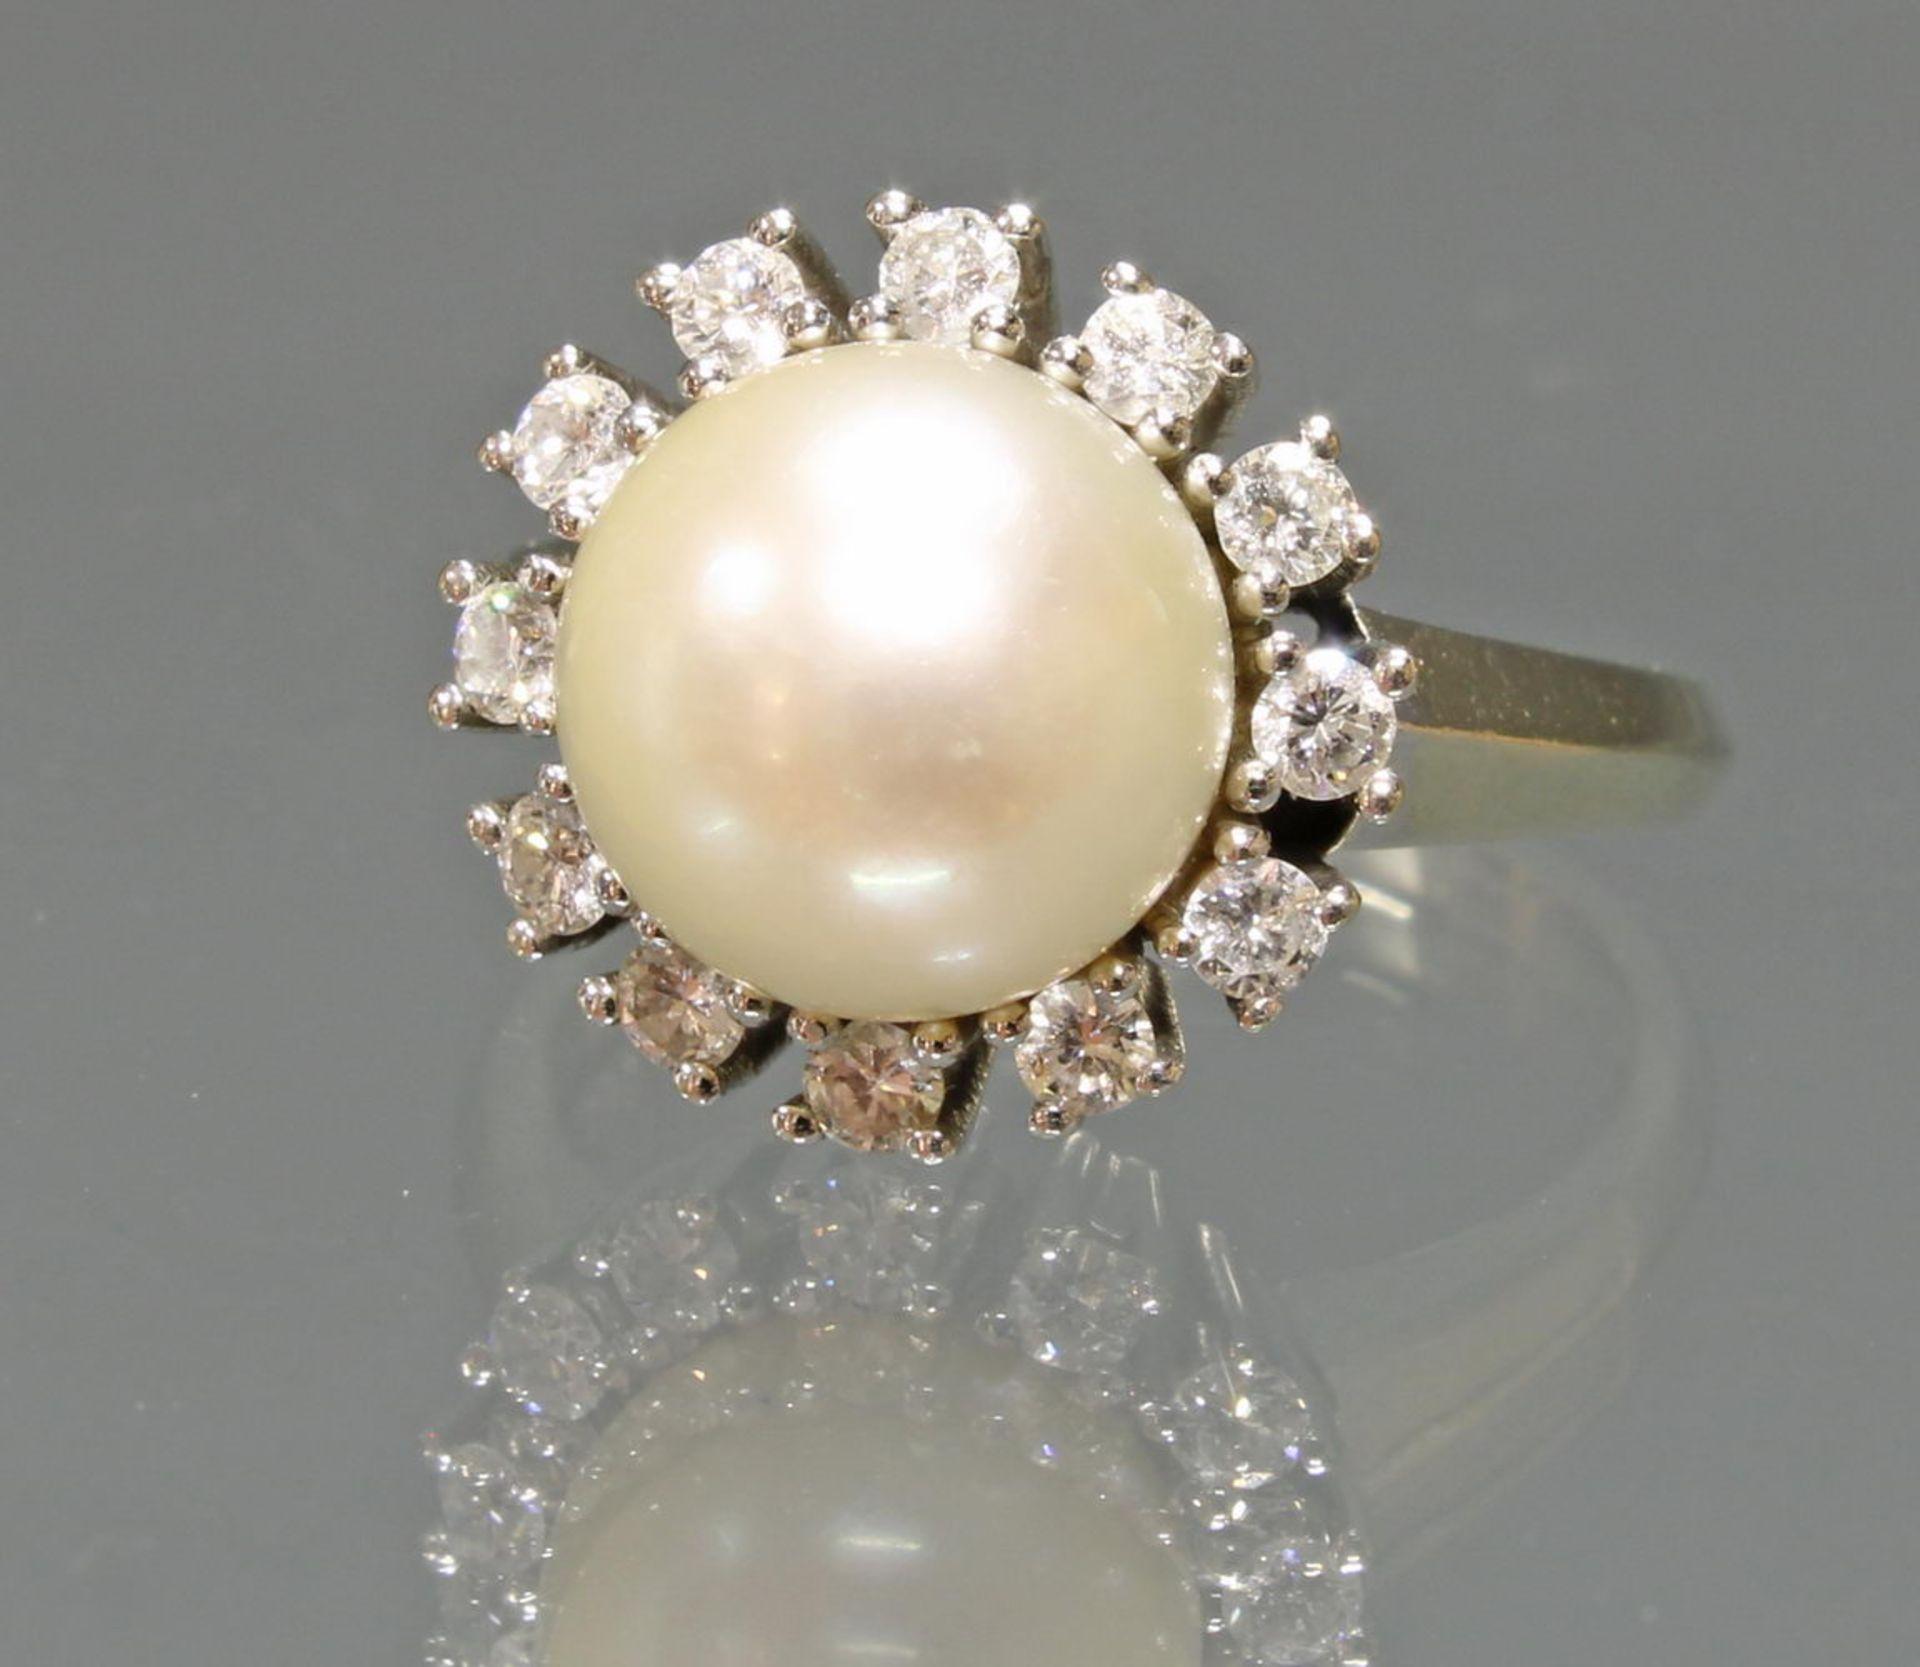 Ring, WG 585, 1 Akoya-Zuchtperle ø 10 mm, 12 Besatzdiamanten gepunzt 0.44 ct., 6 g, RM 16.5